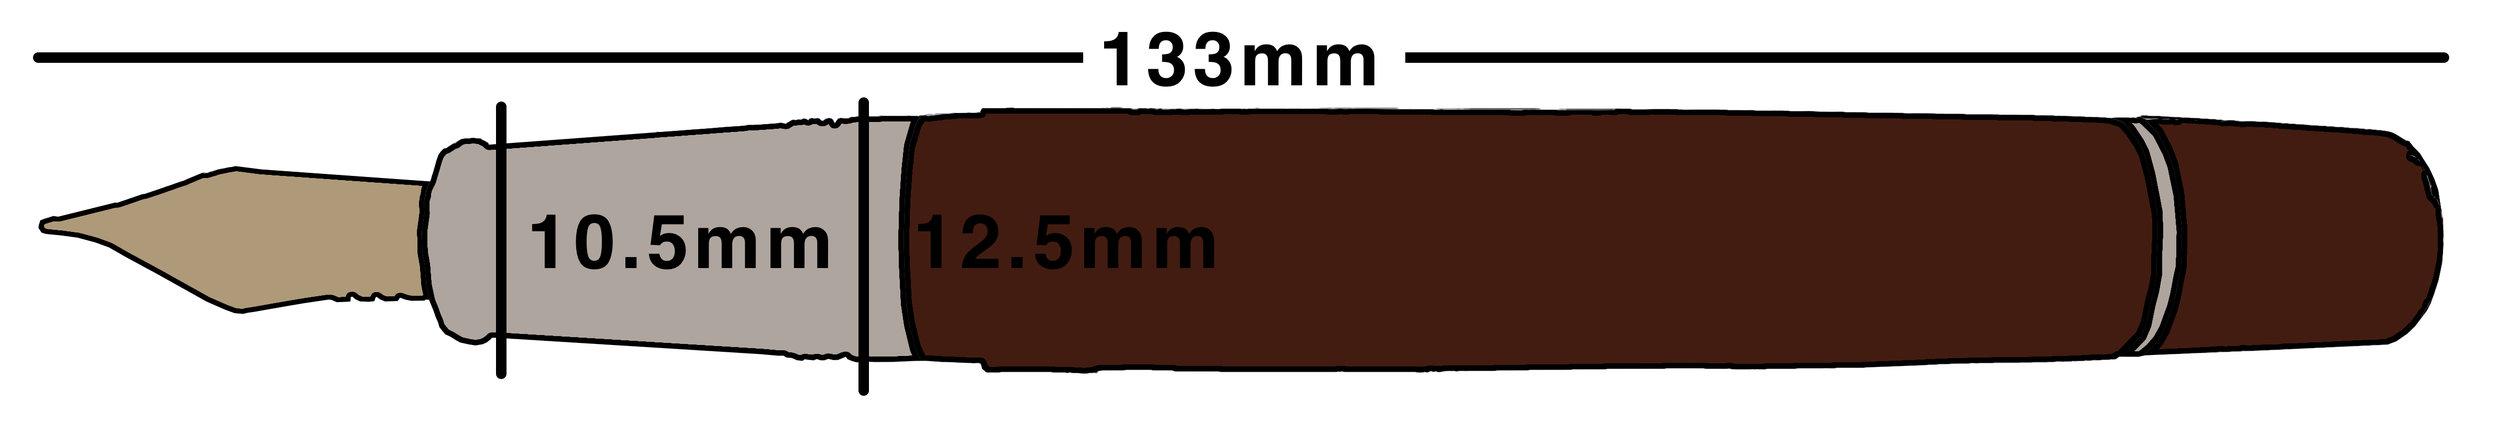 Diagram Uncapped.jpg